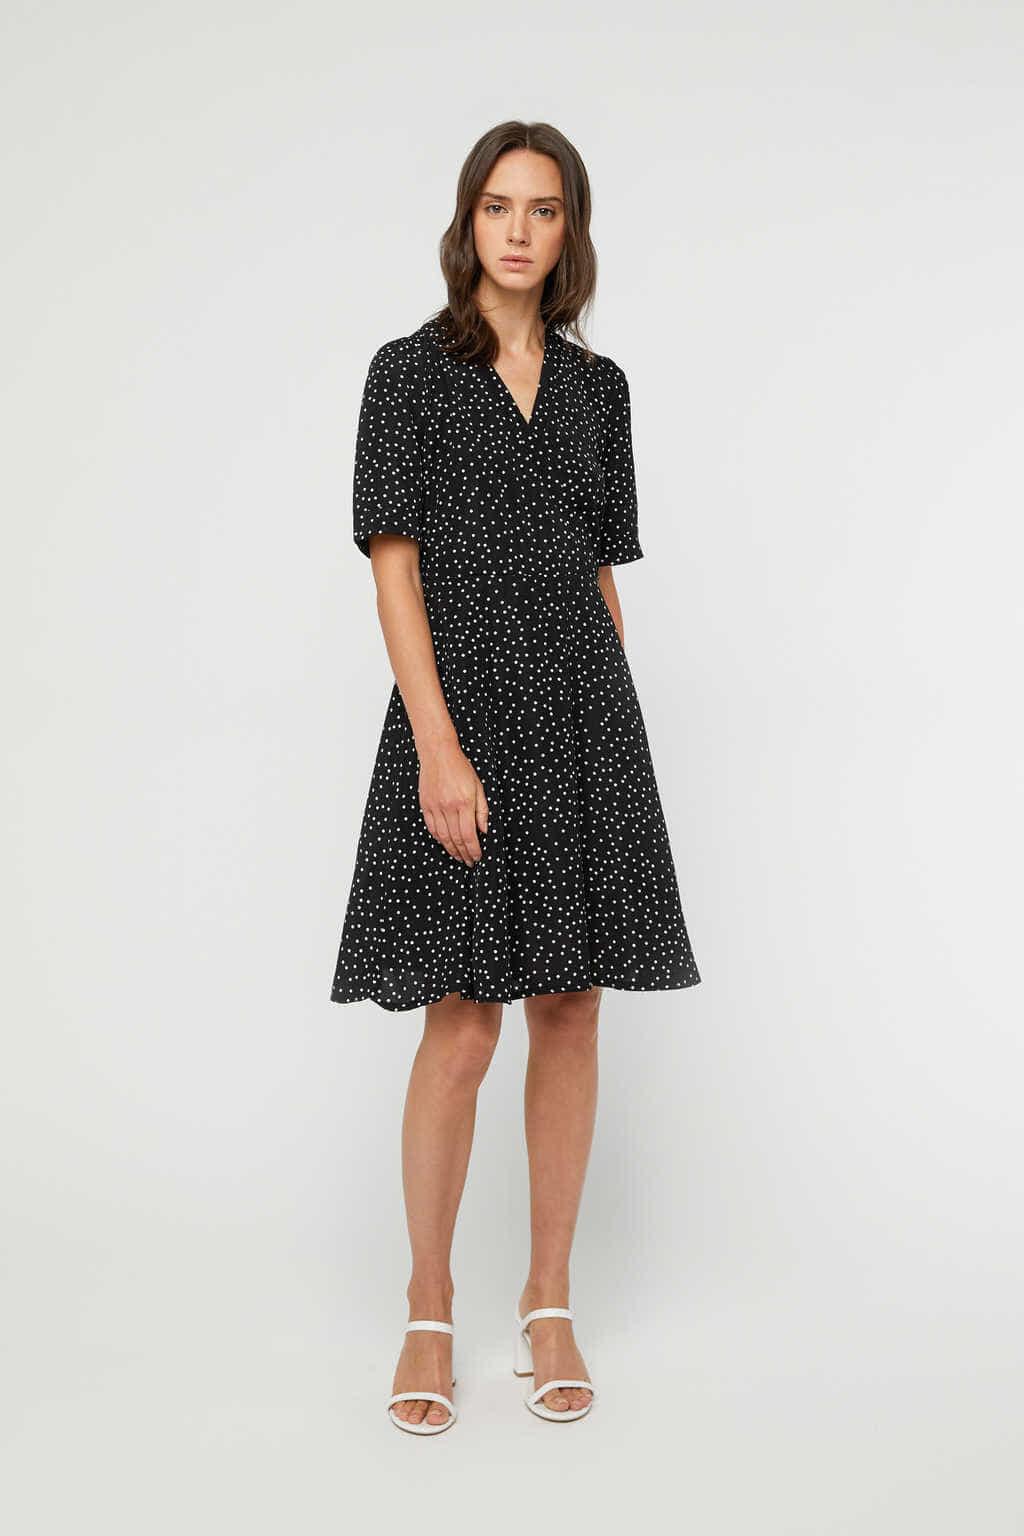 Dress K026 Black 1